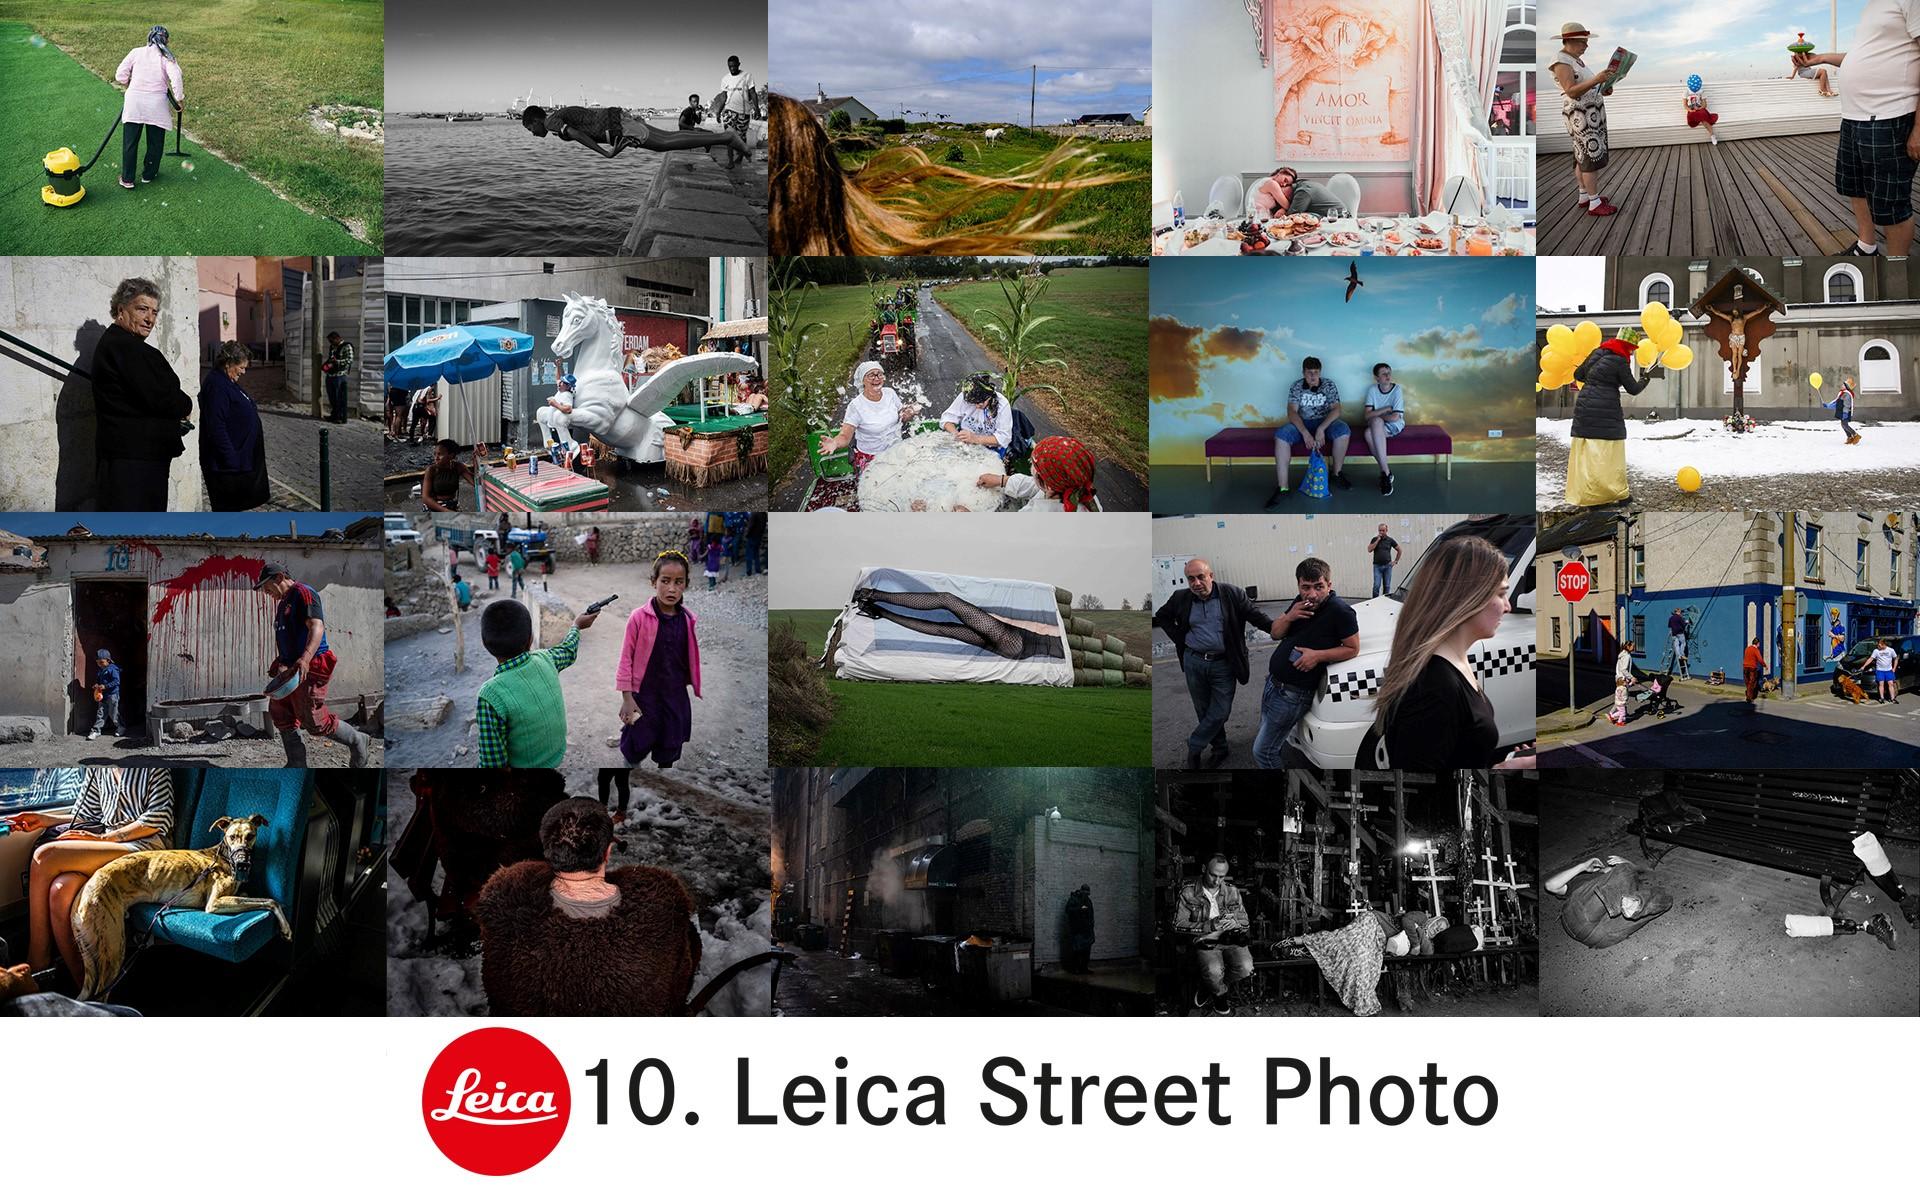 Leica Street Photo Contest